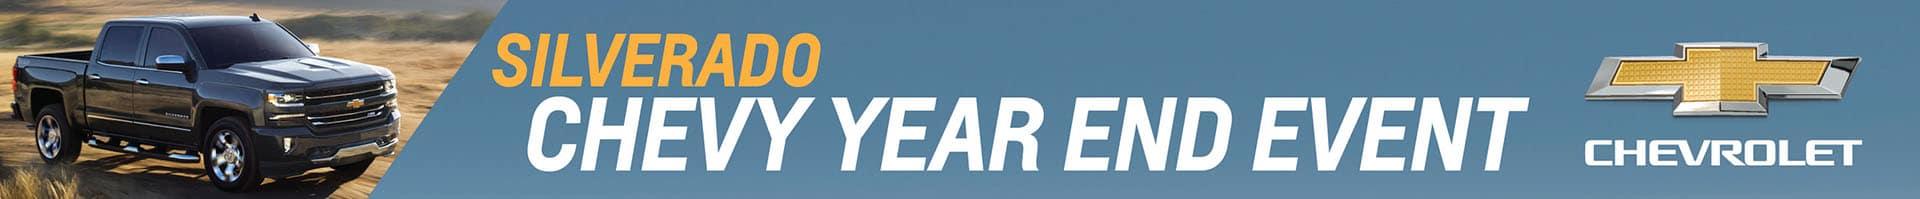 Chevrolet Silverado Year End Event Banner